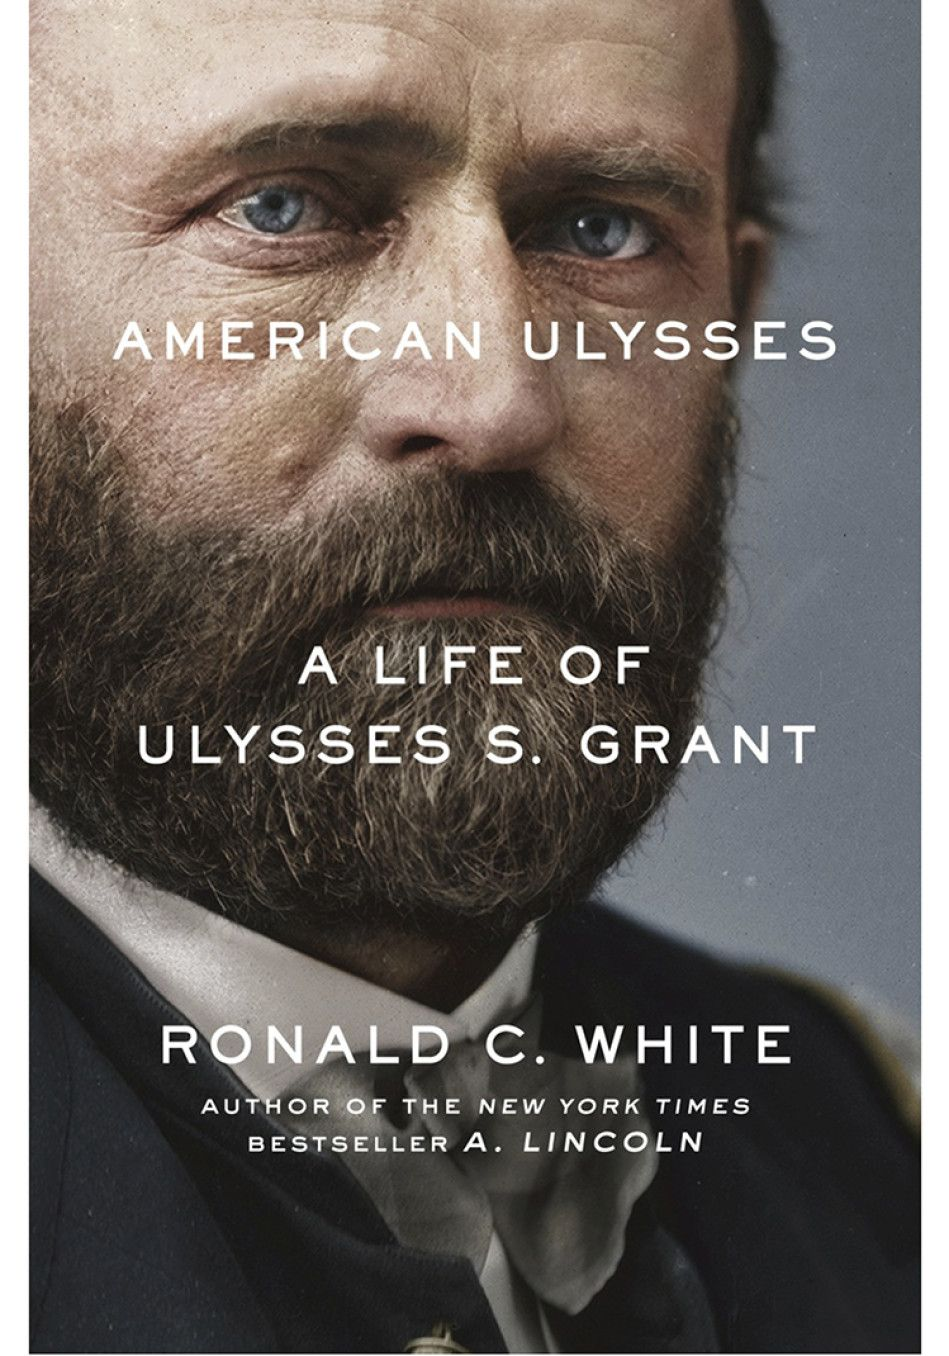 American ulysses a life of ulysses s grant ulysses s